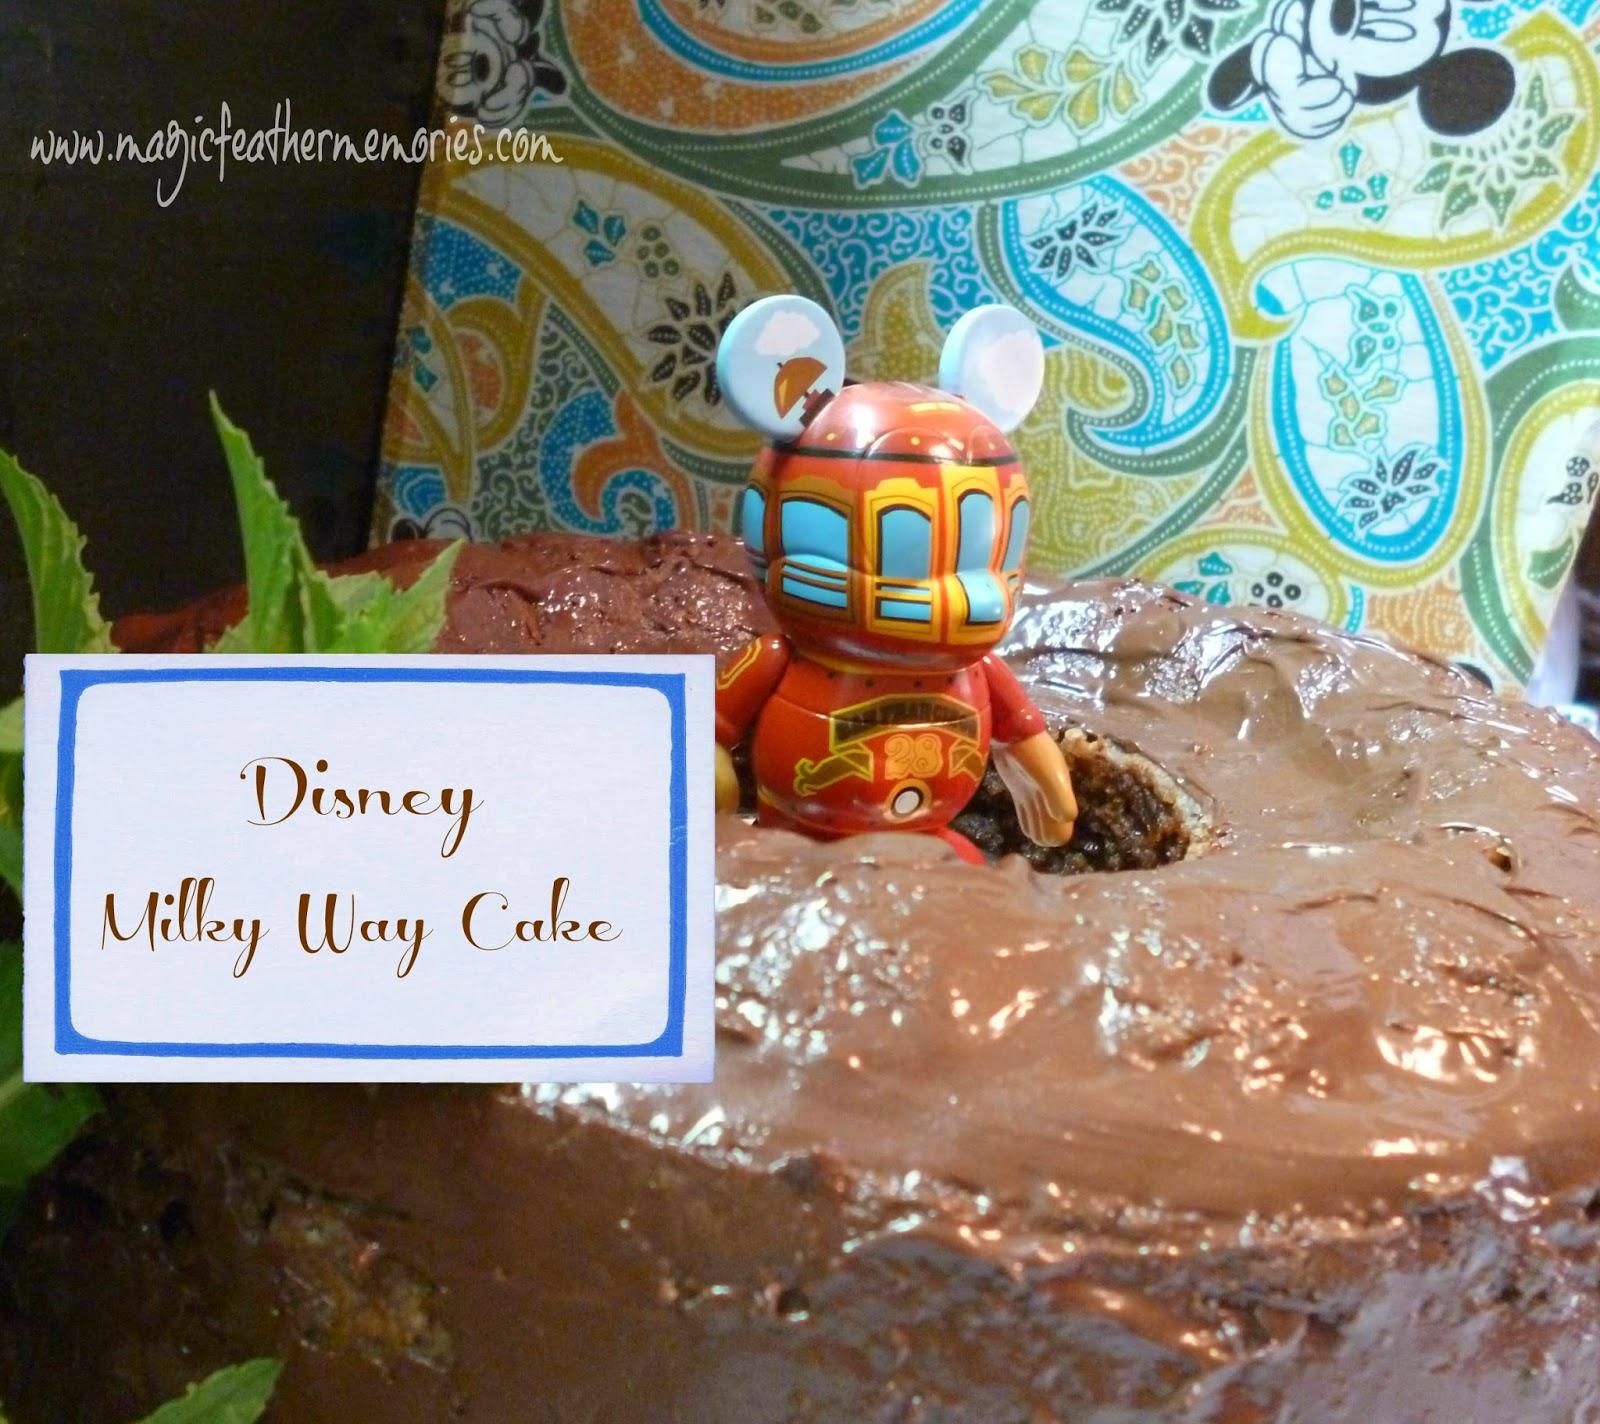 Disneyland Sweet Memories Cake Recipe